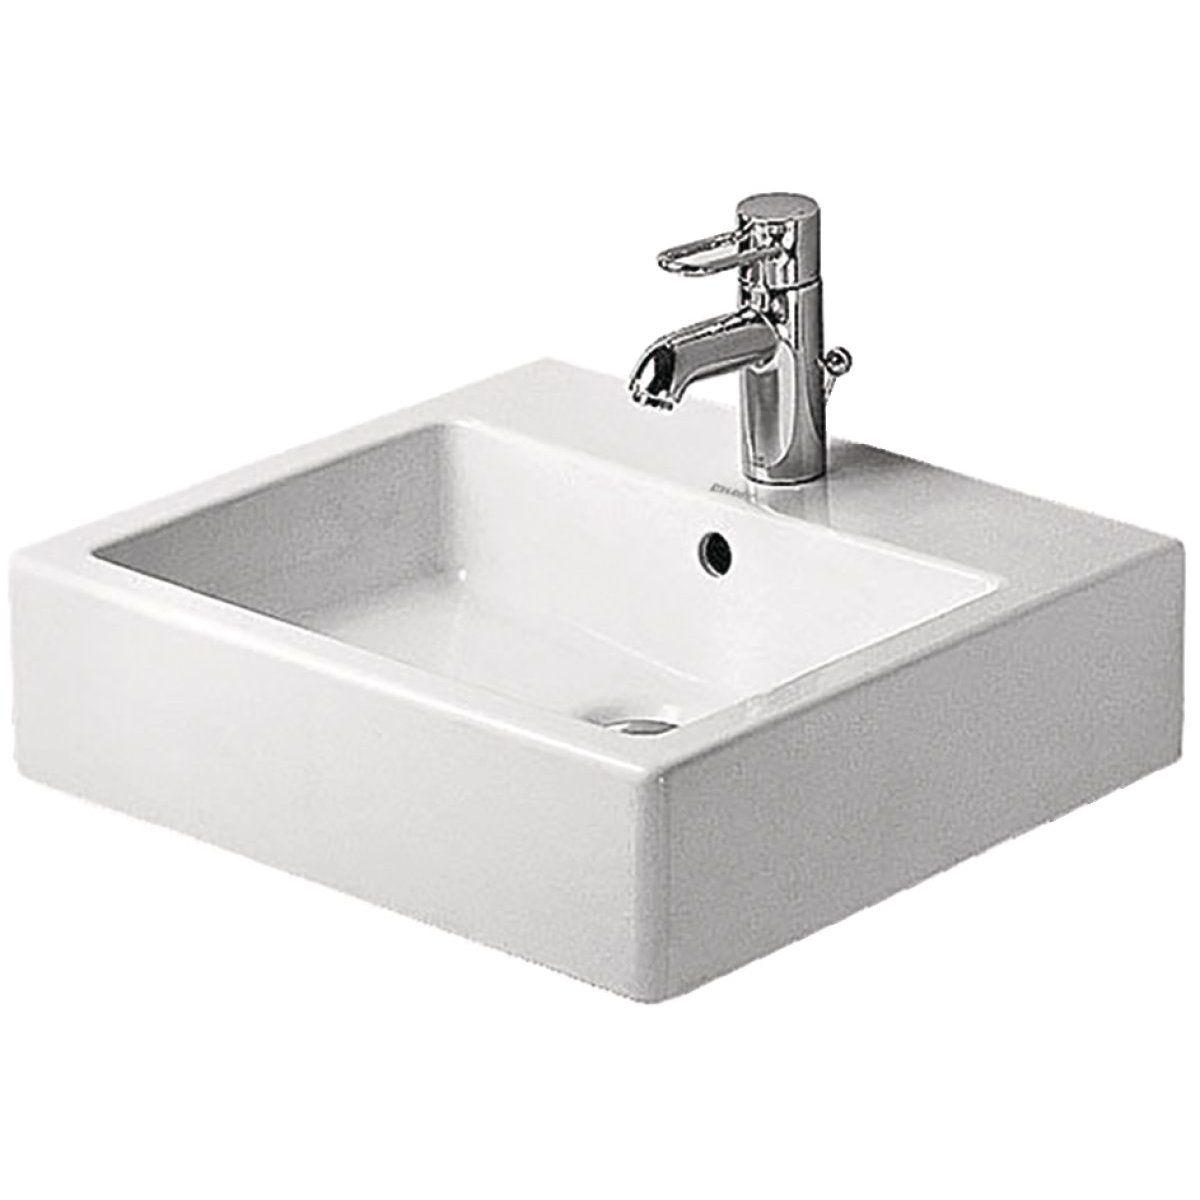 Lavabo 50 vero blanc 04545000001 - DURAVIT - null   Chalet Main ...